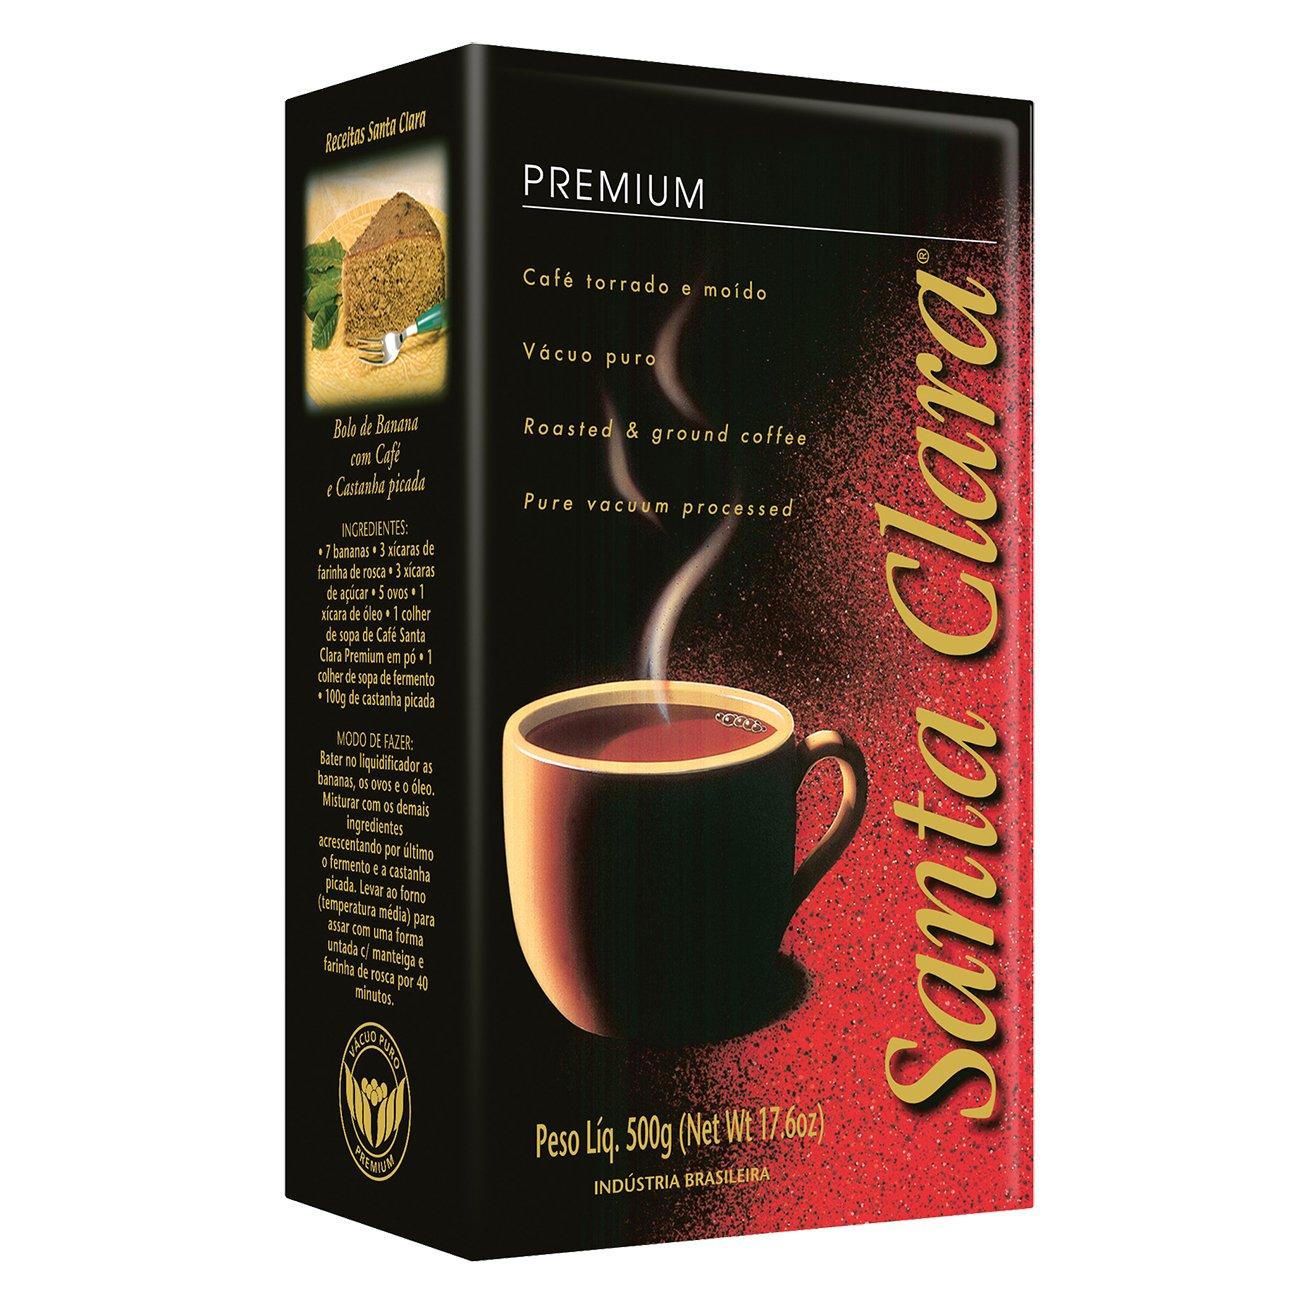 Amazon.com: Santa Clara Classico Brazilian Coffee, Ground 500 Grams (Pack of 1): Office Products